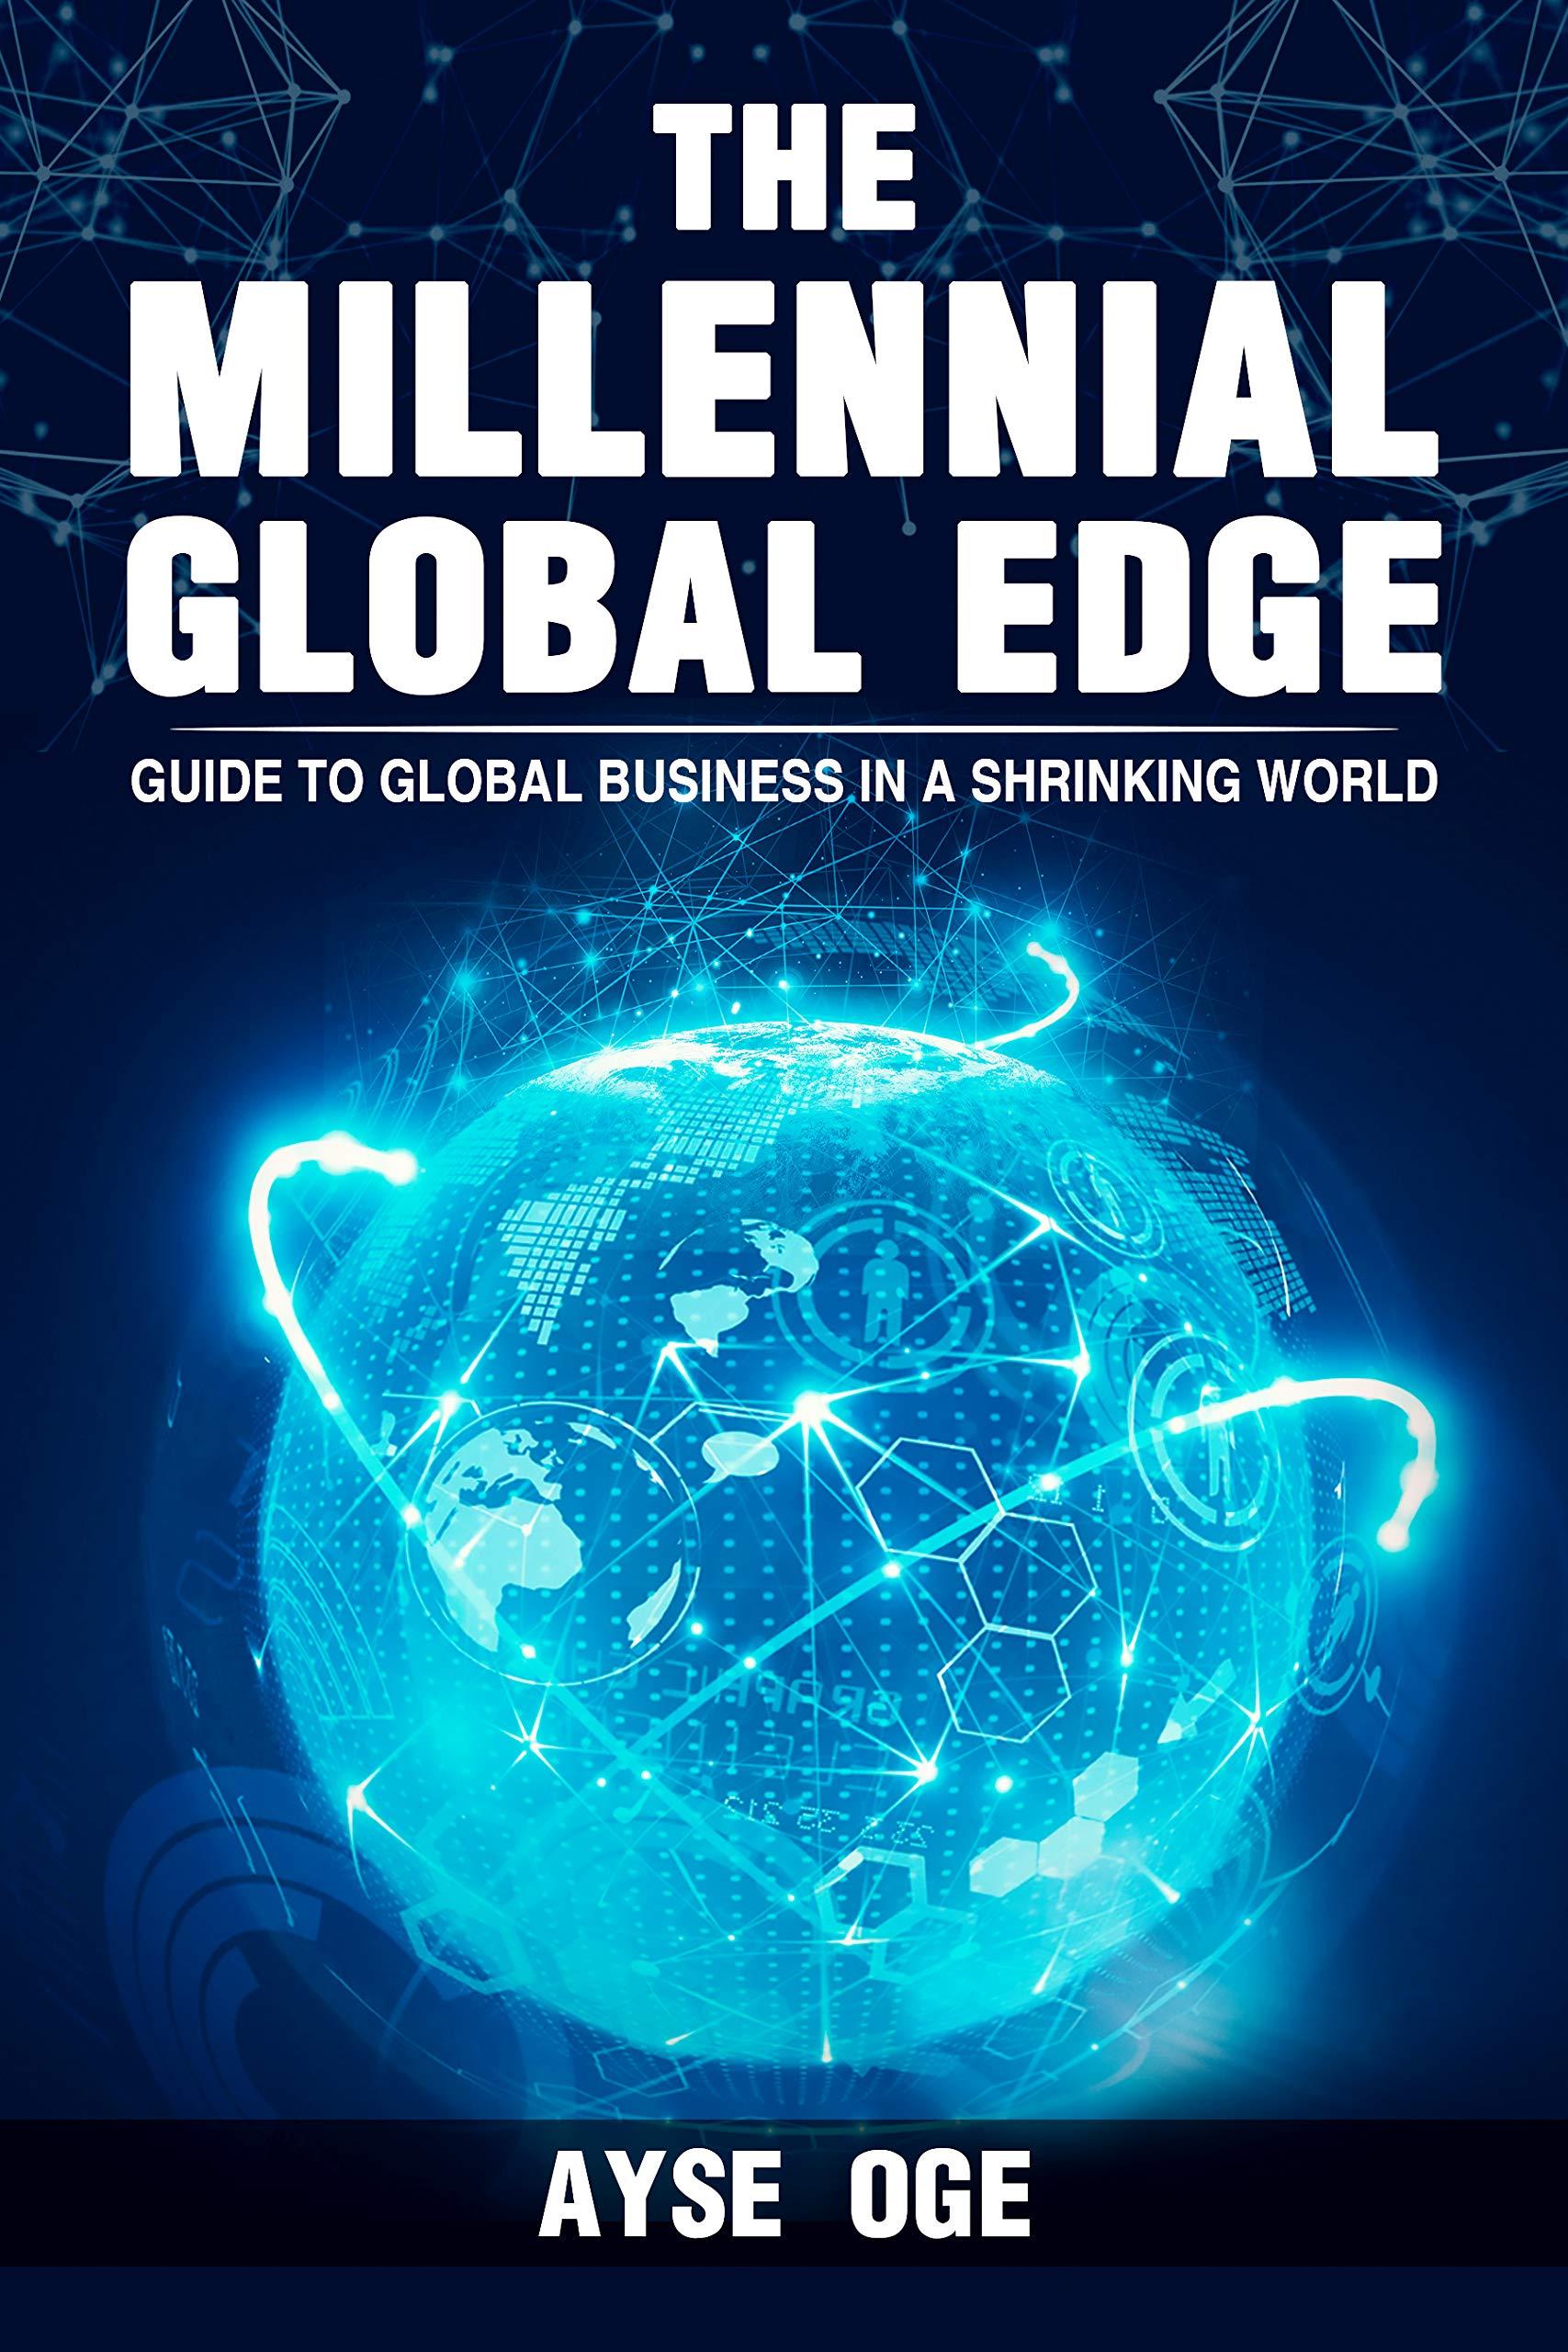 The Millennial Global Edge